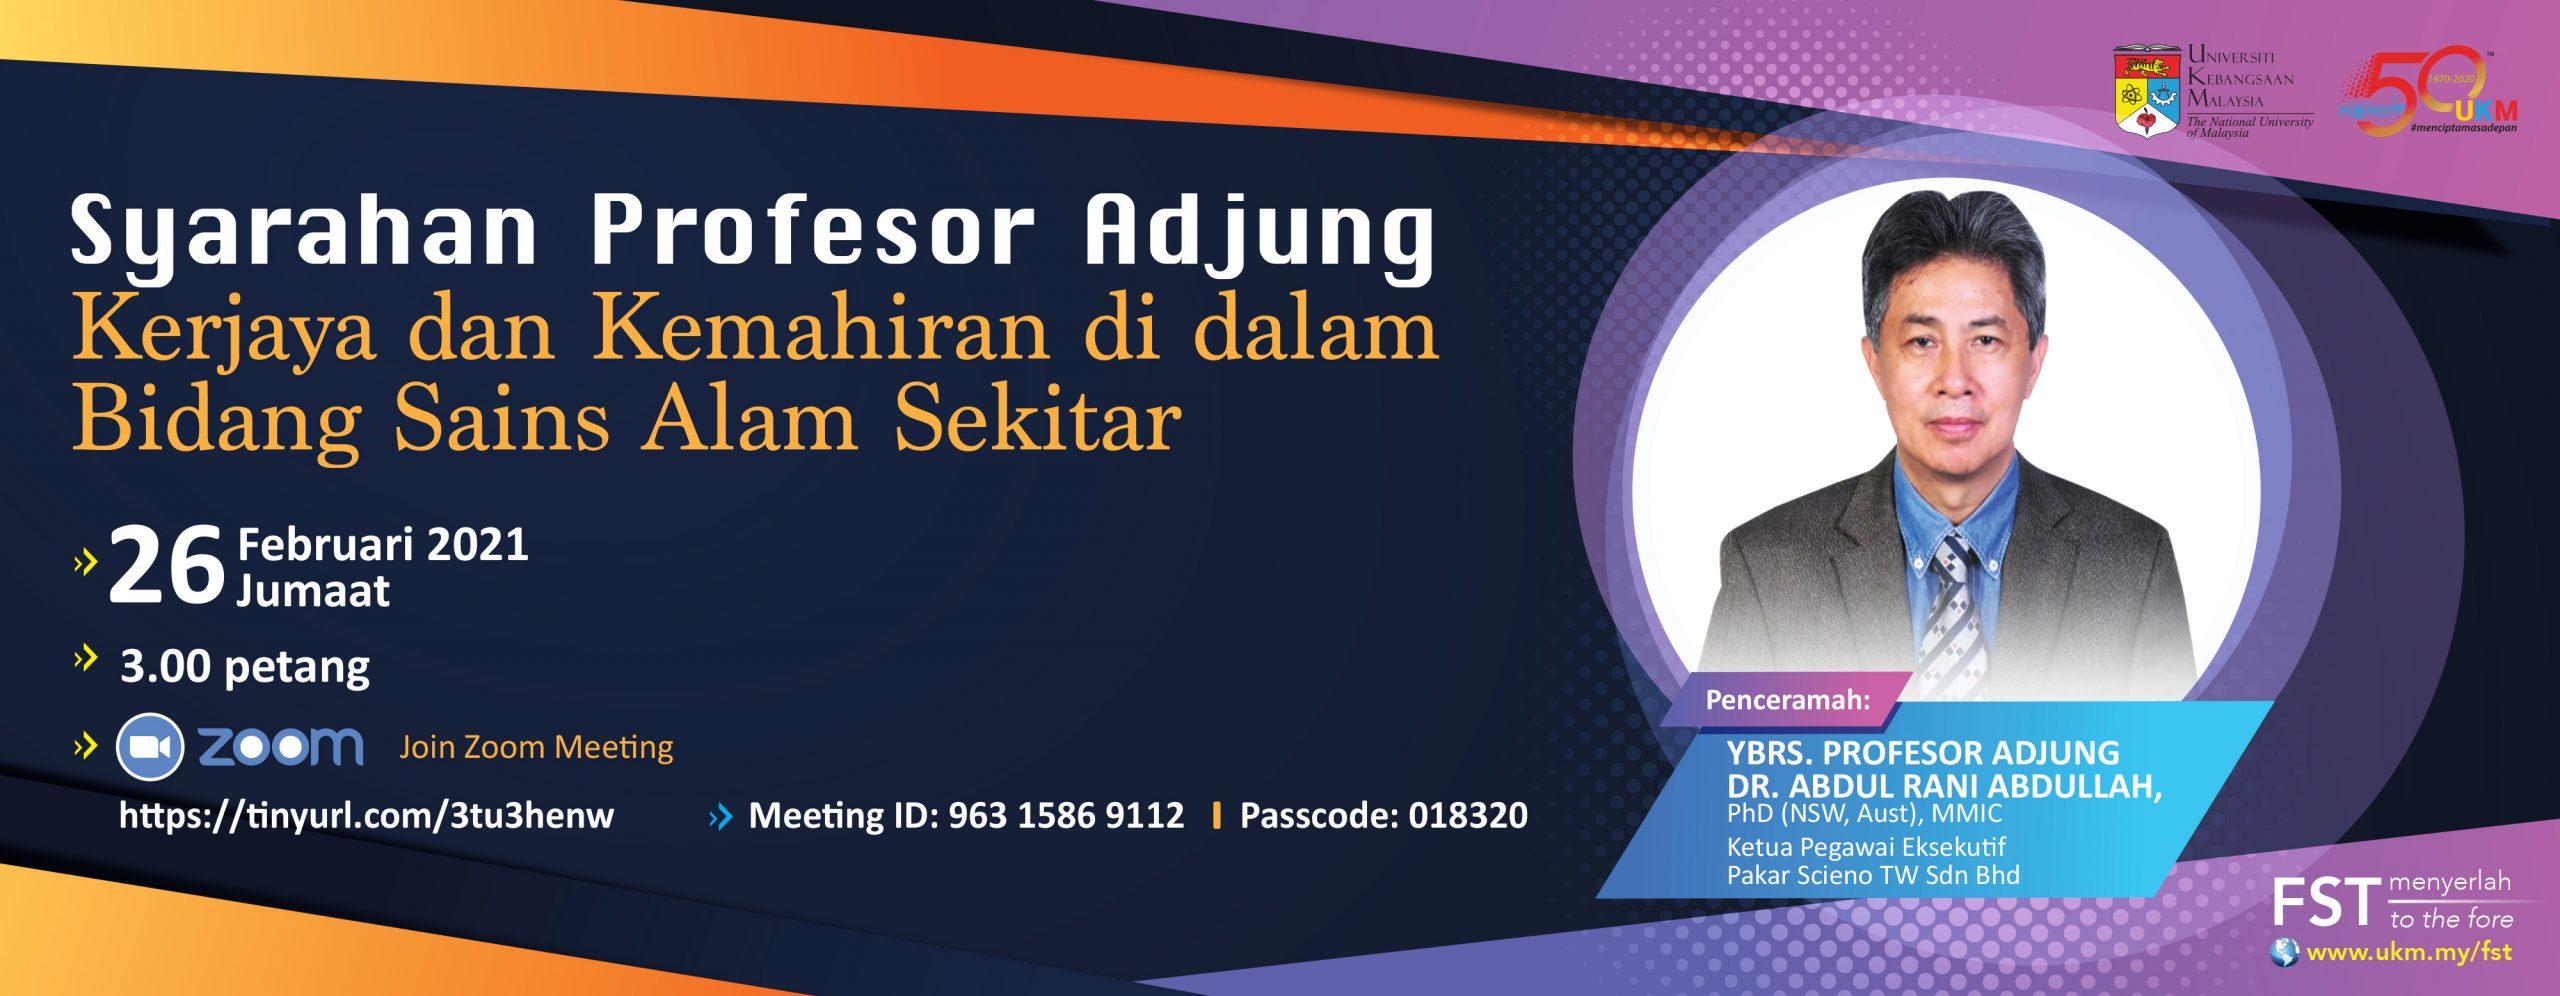 Syarahan Profesor Adjung